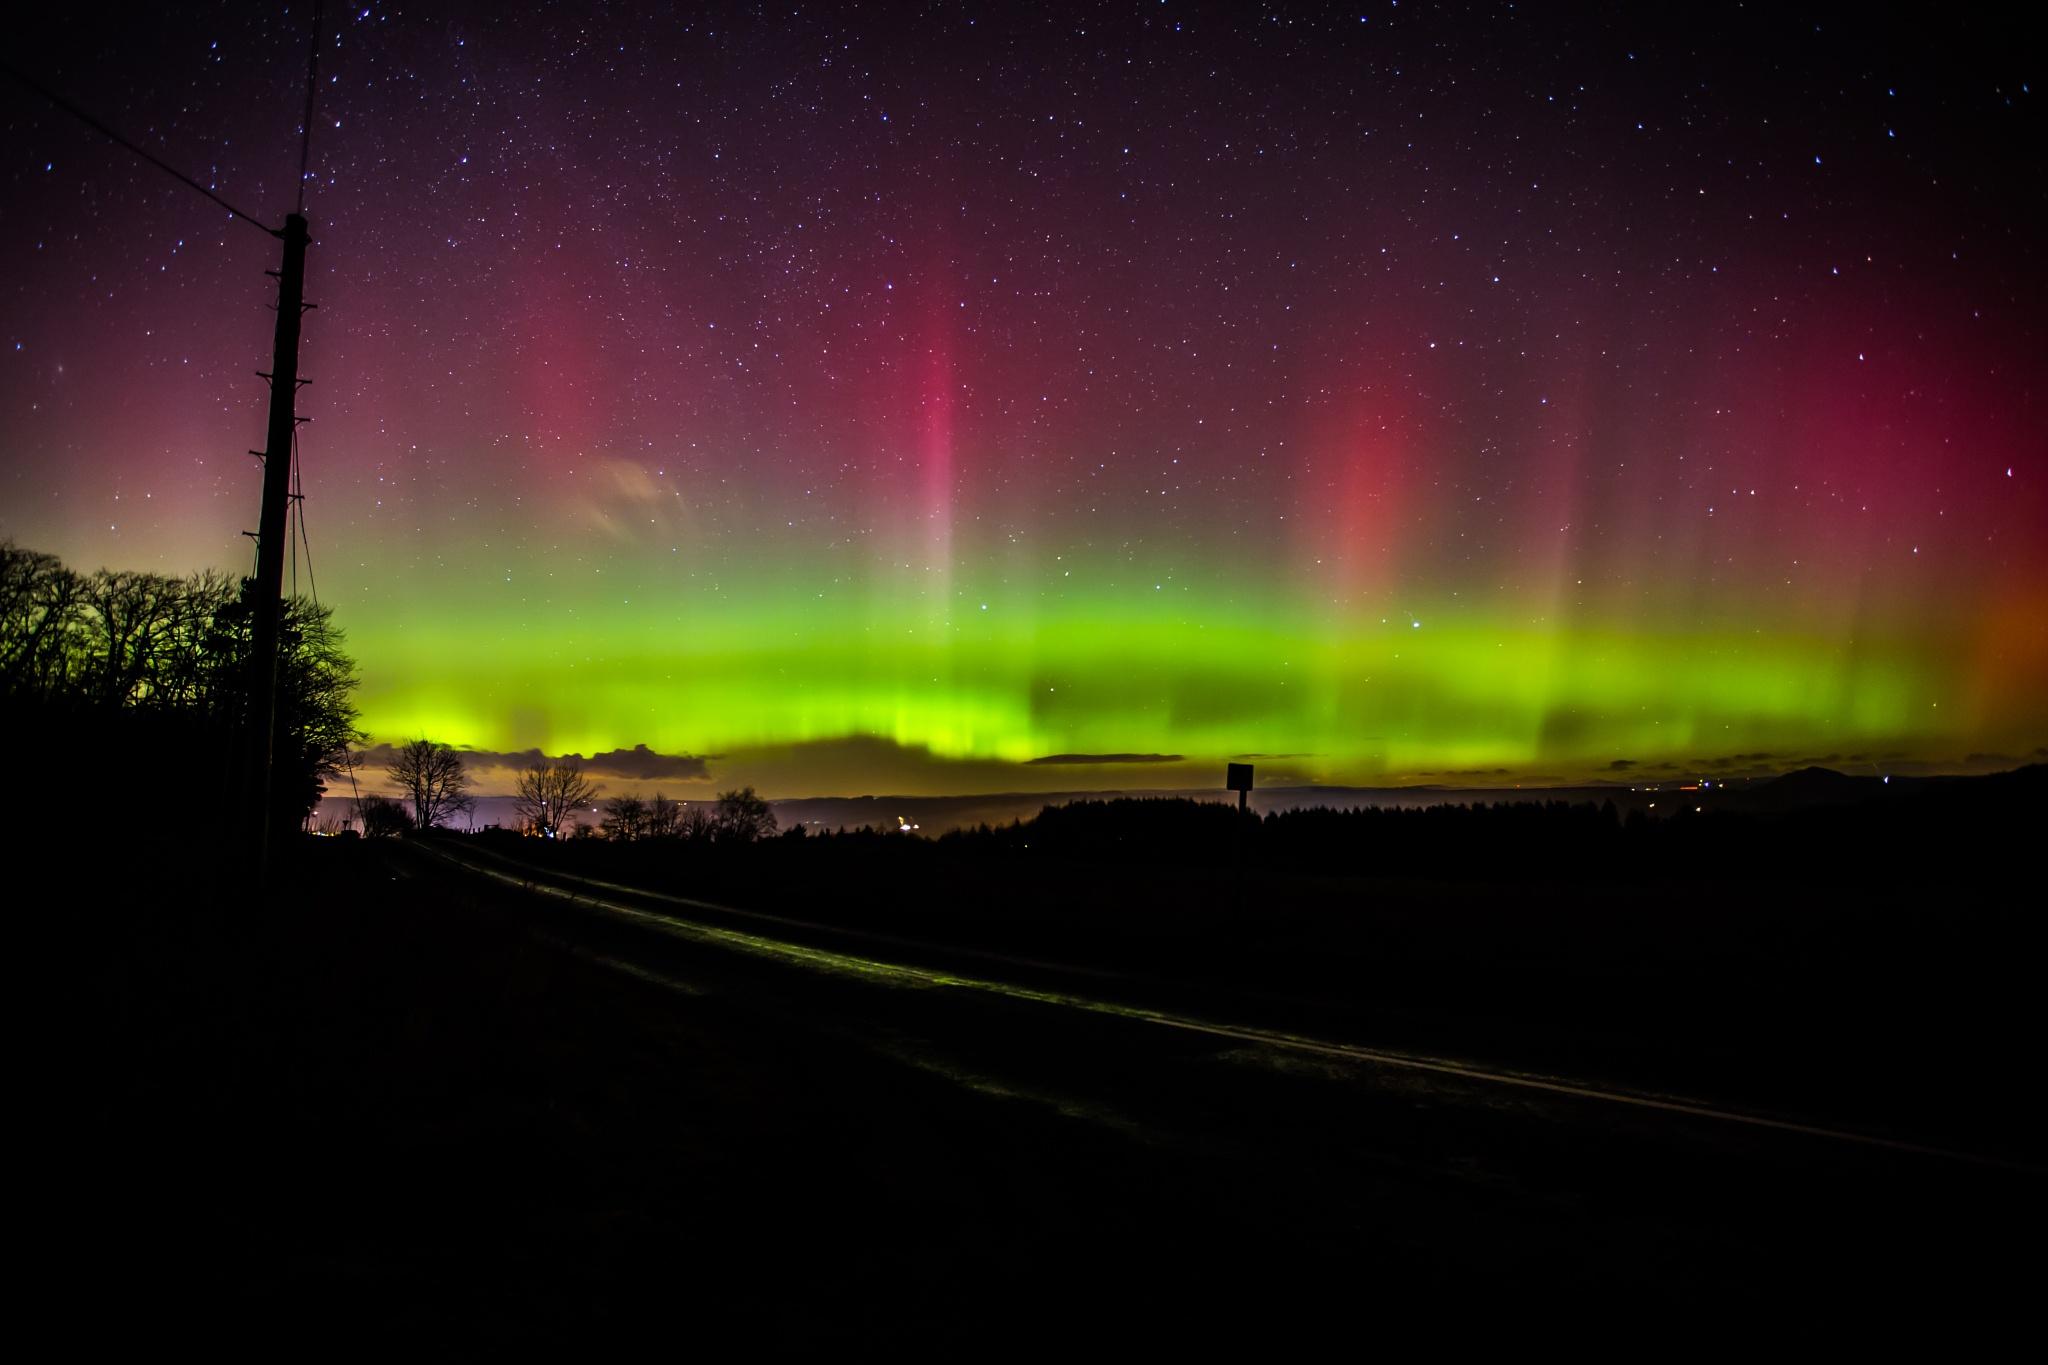 Northern Lights 2 by Jamzlindsay